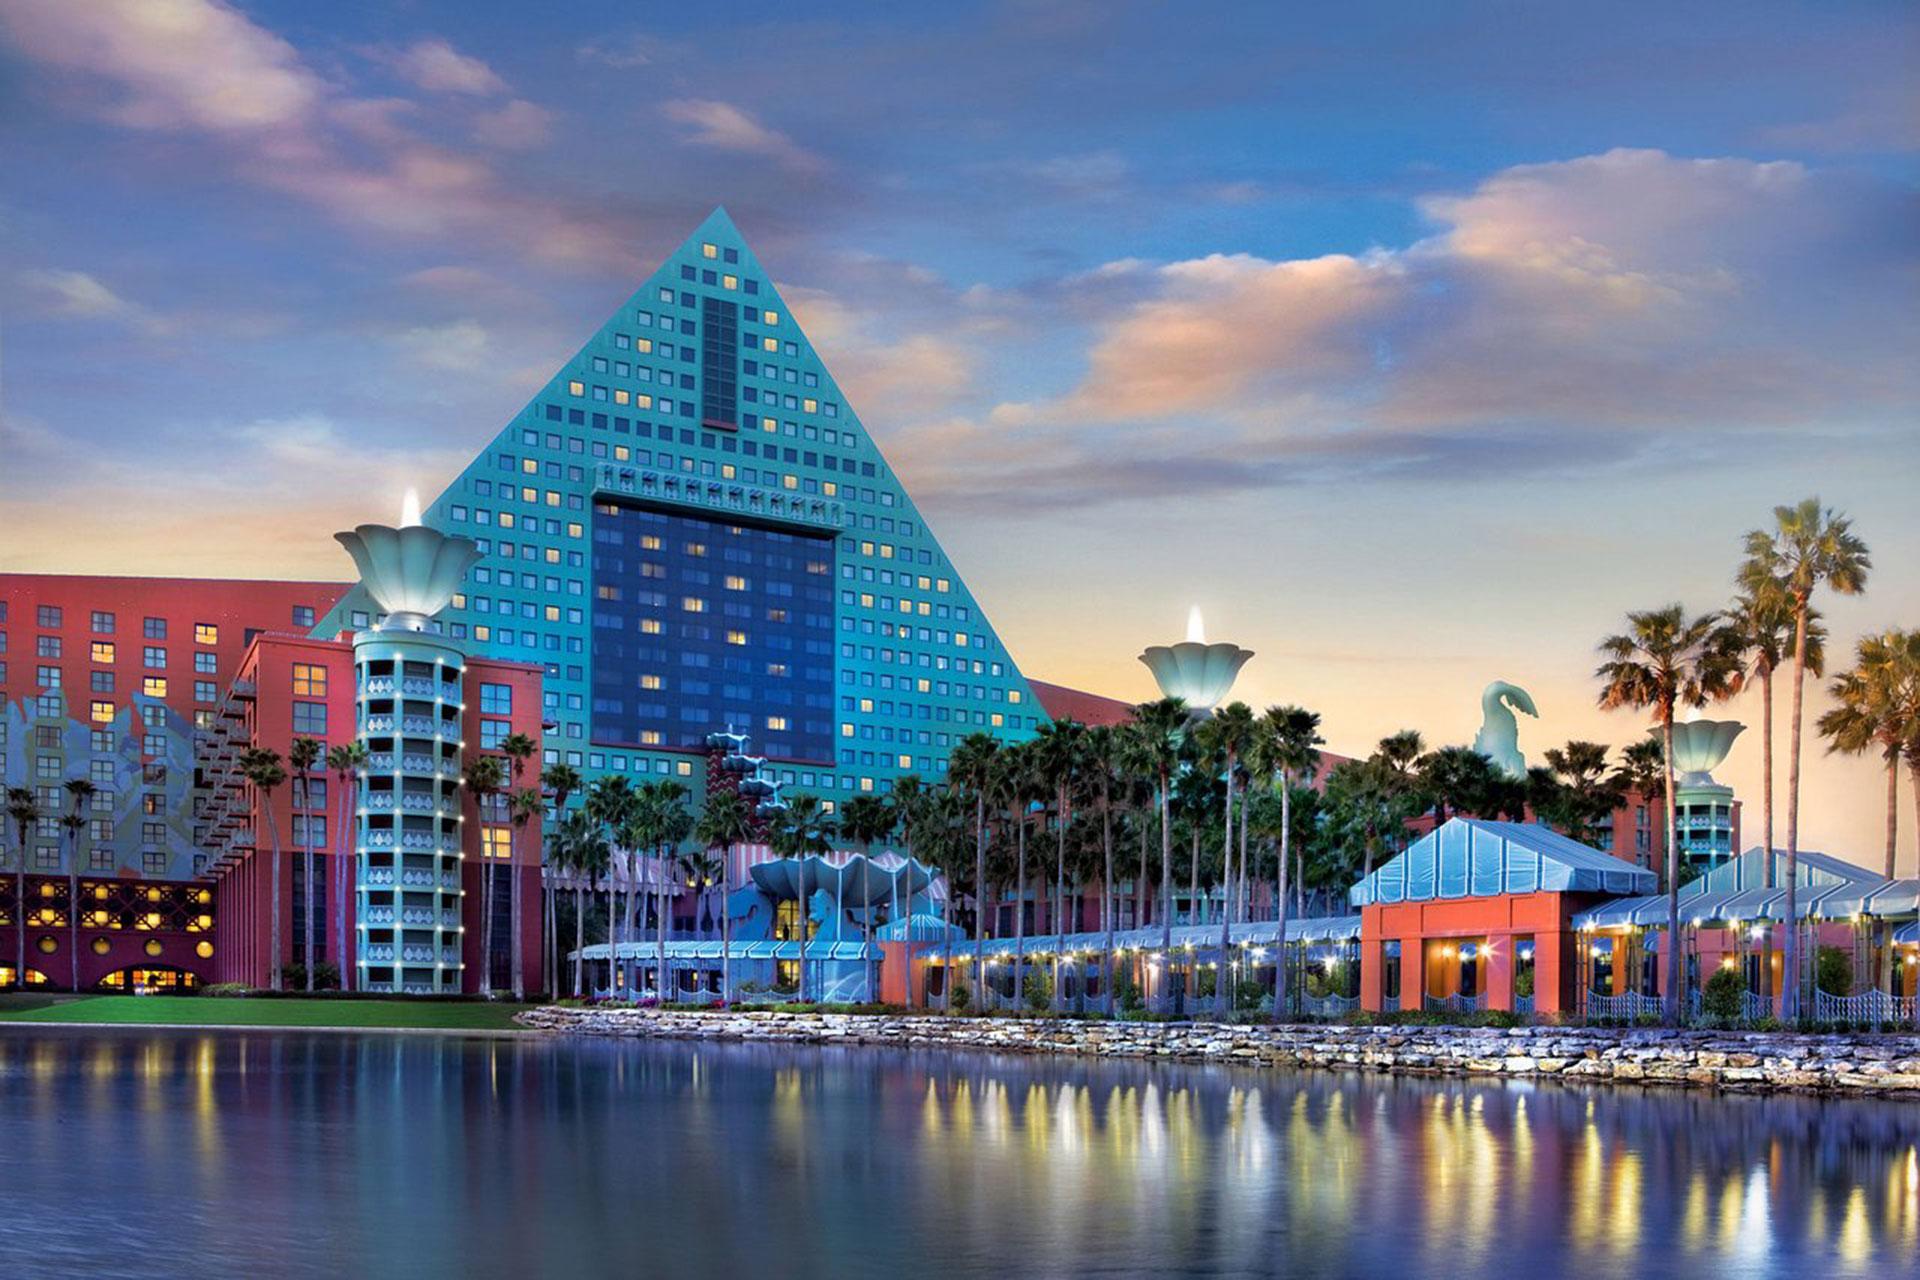 Walt Disney World Swan & Dolphin Resort; Courtesy of Walt Disney World Swan & Dolphin Resort